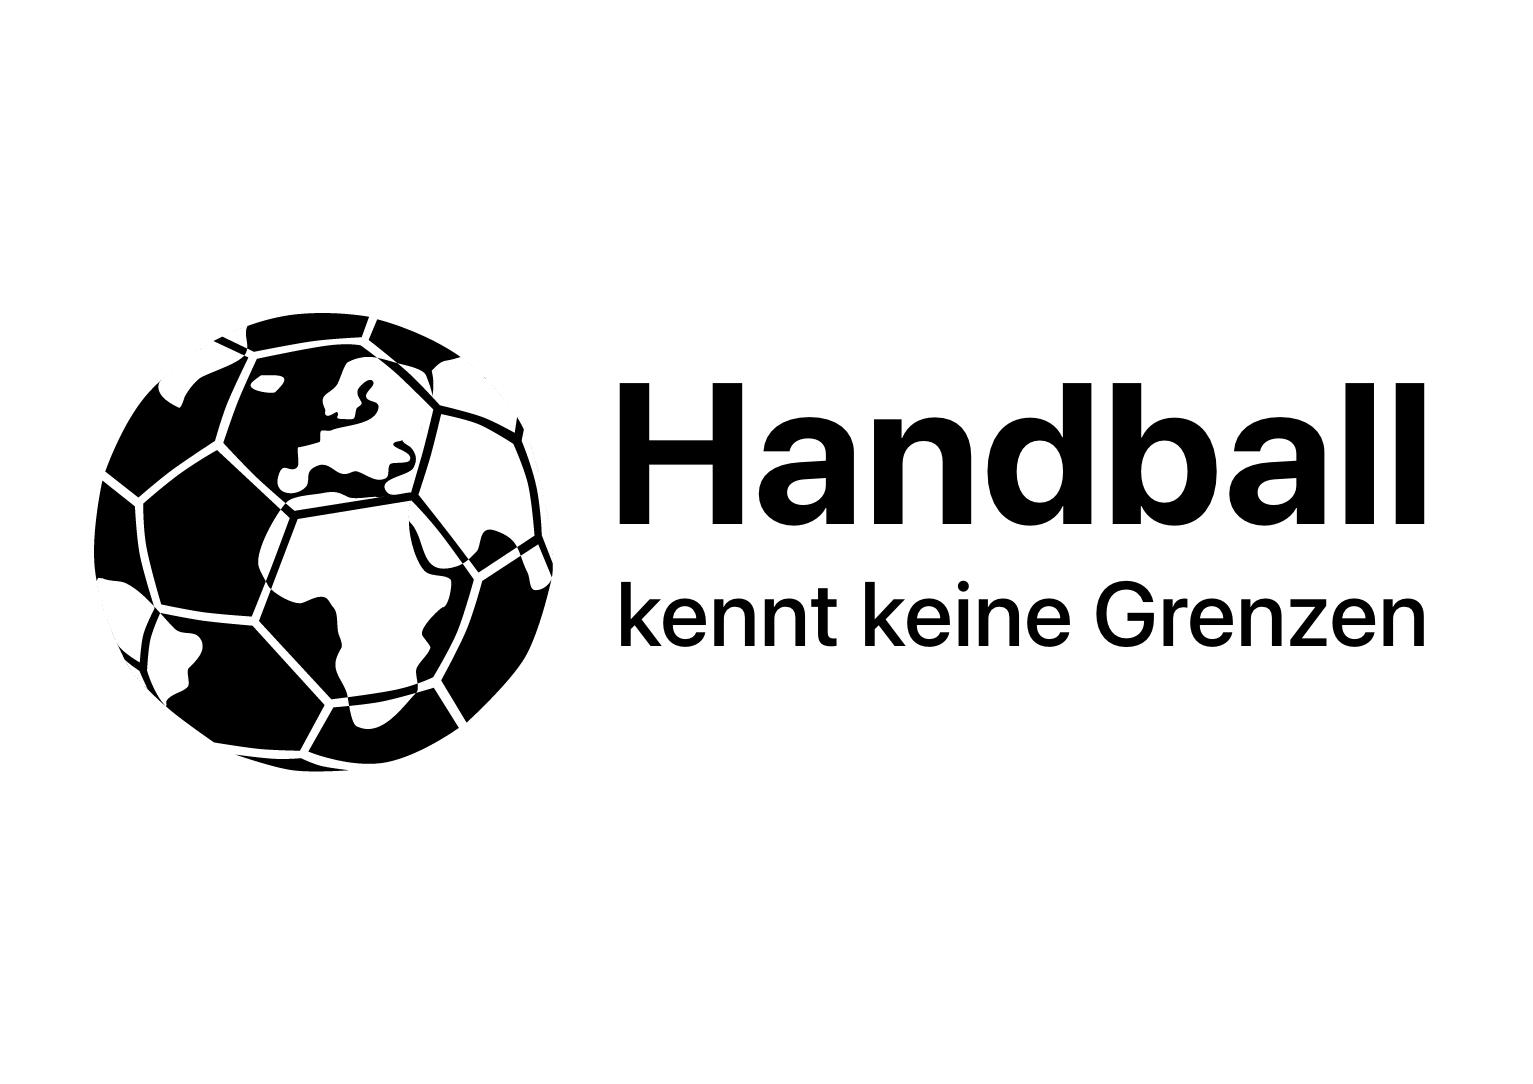 HkkG-HkkG-Weiß-OneTeam